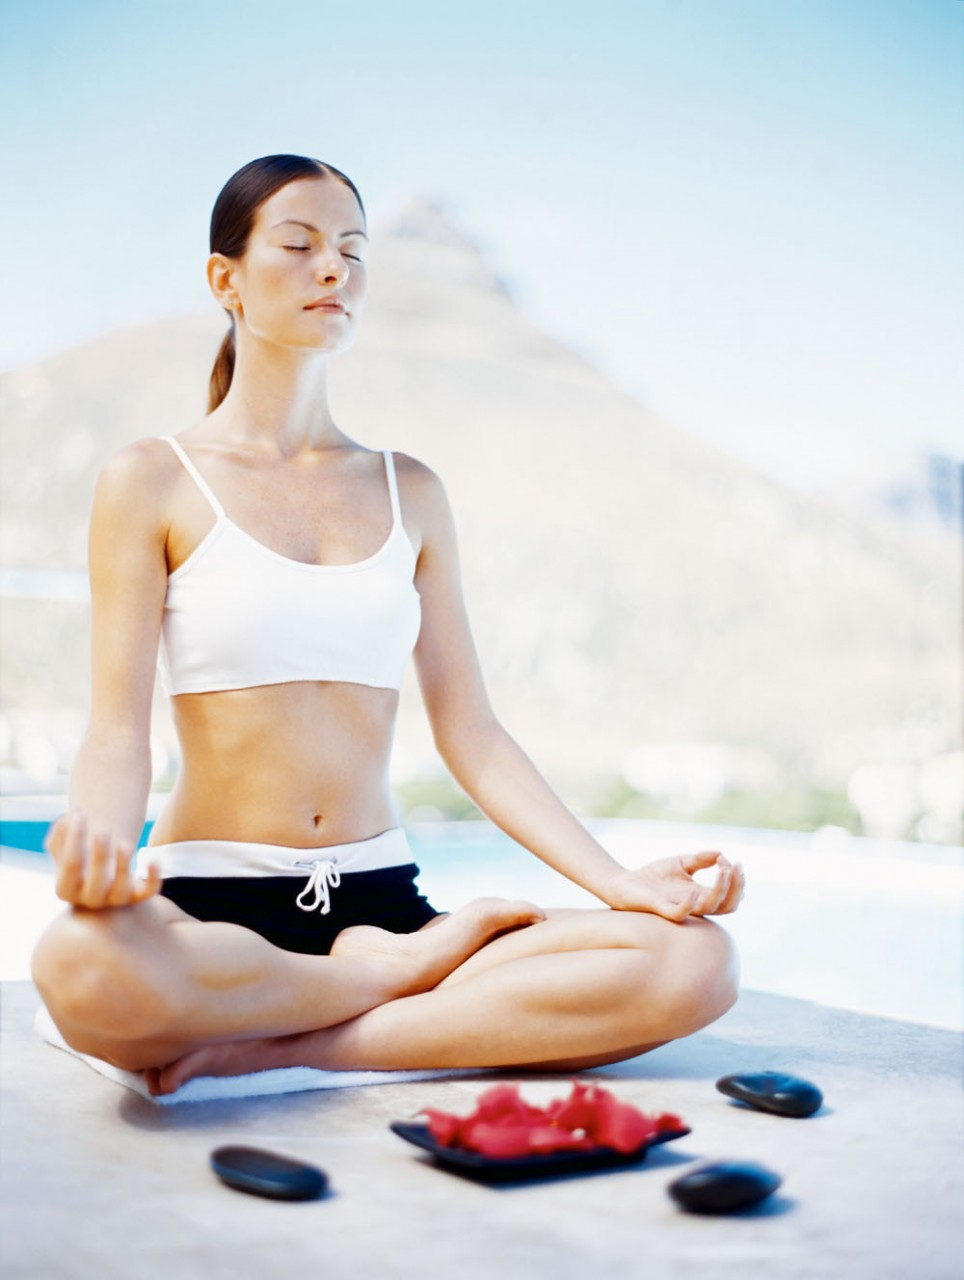 Йога, не йога: 10 советов начинающим